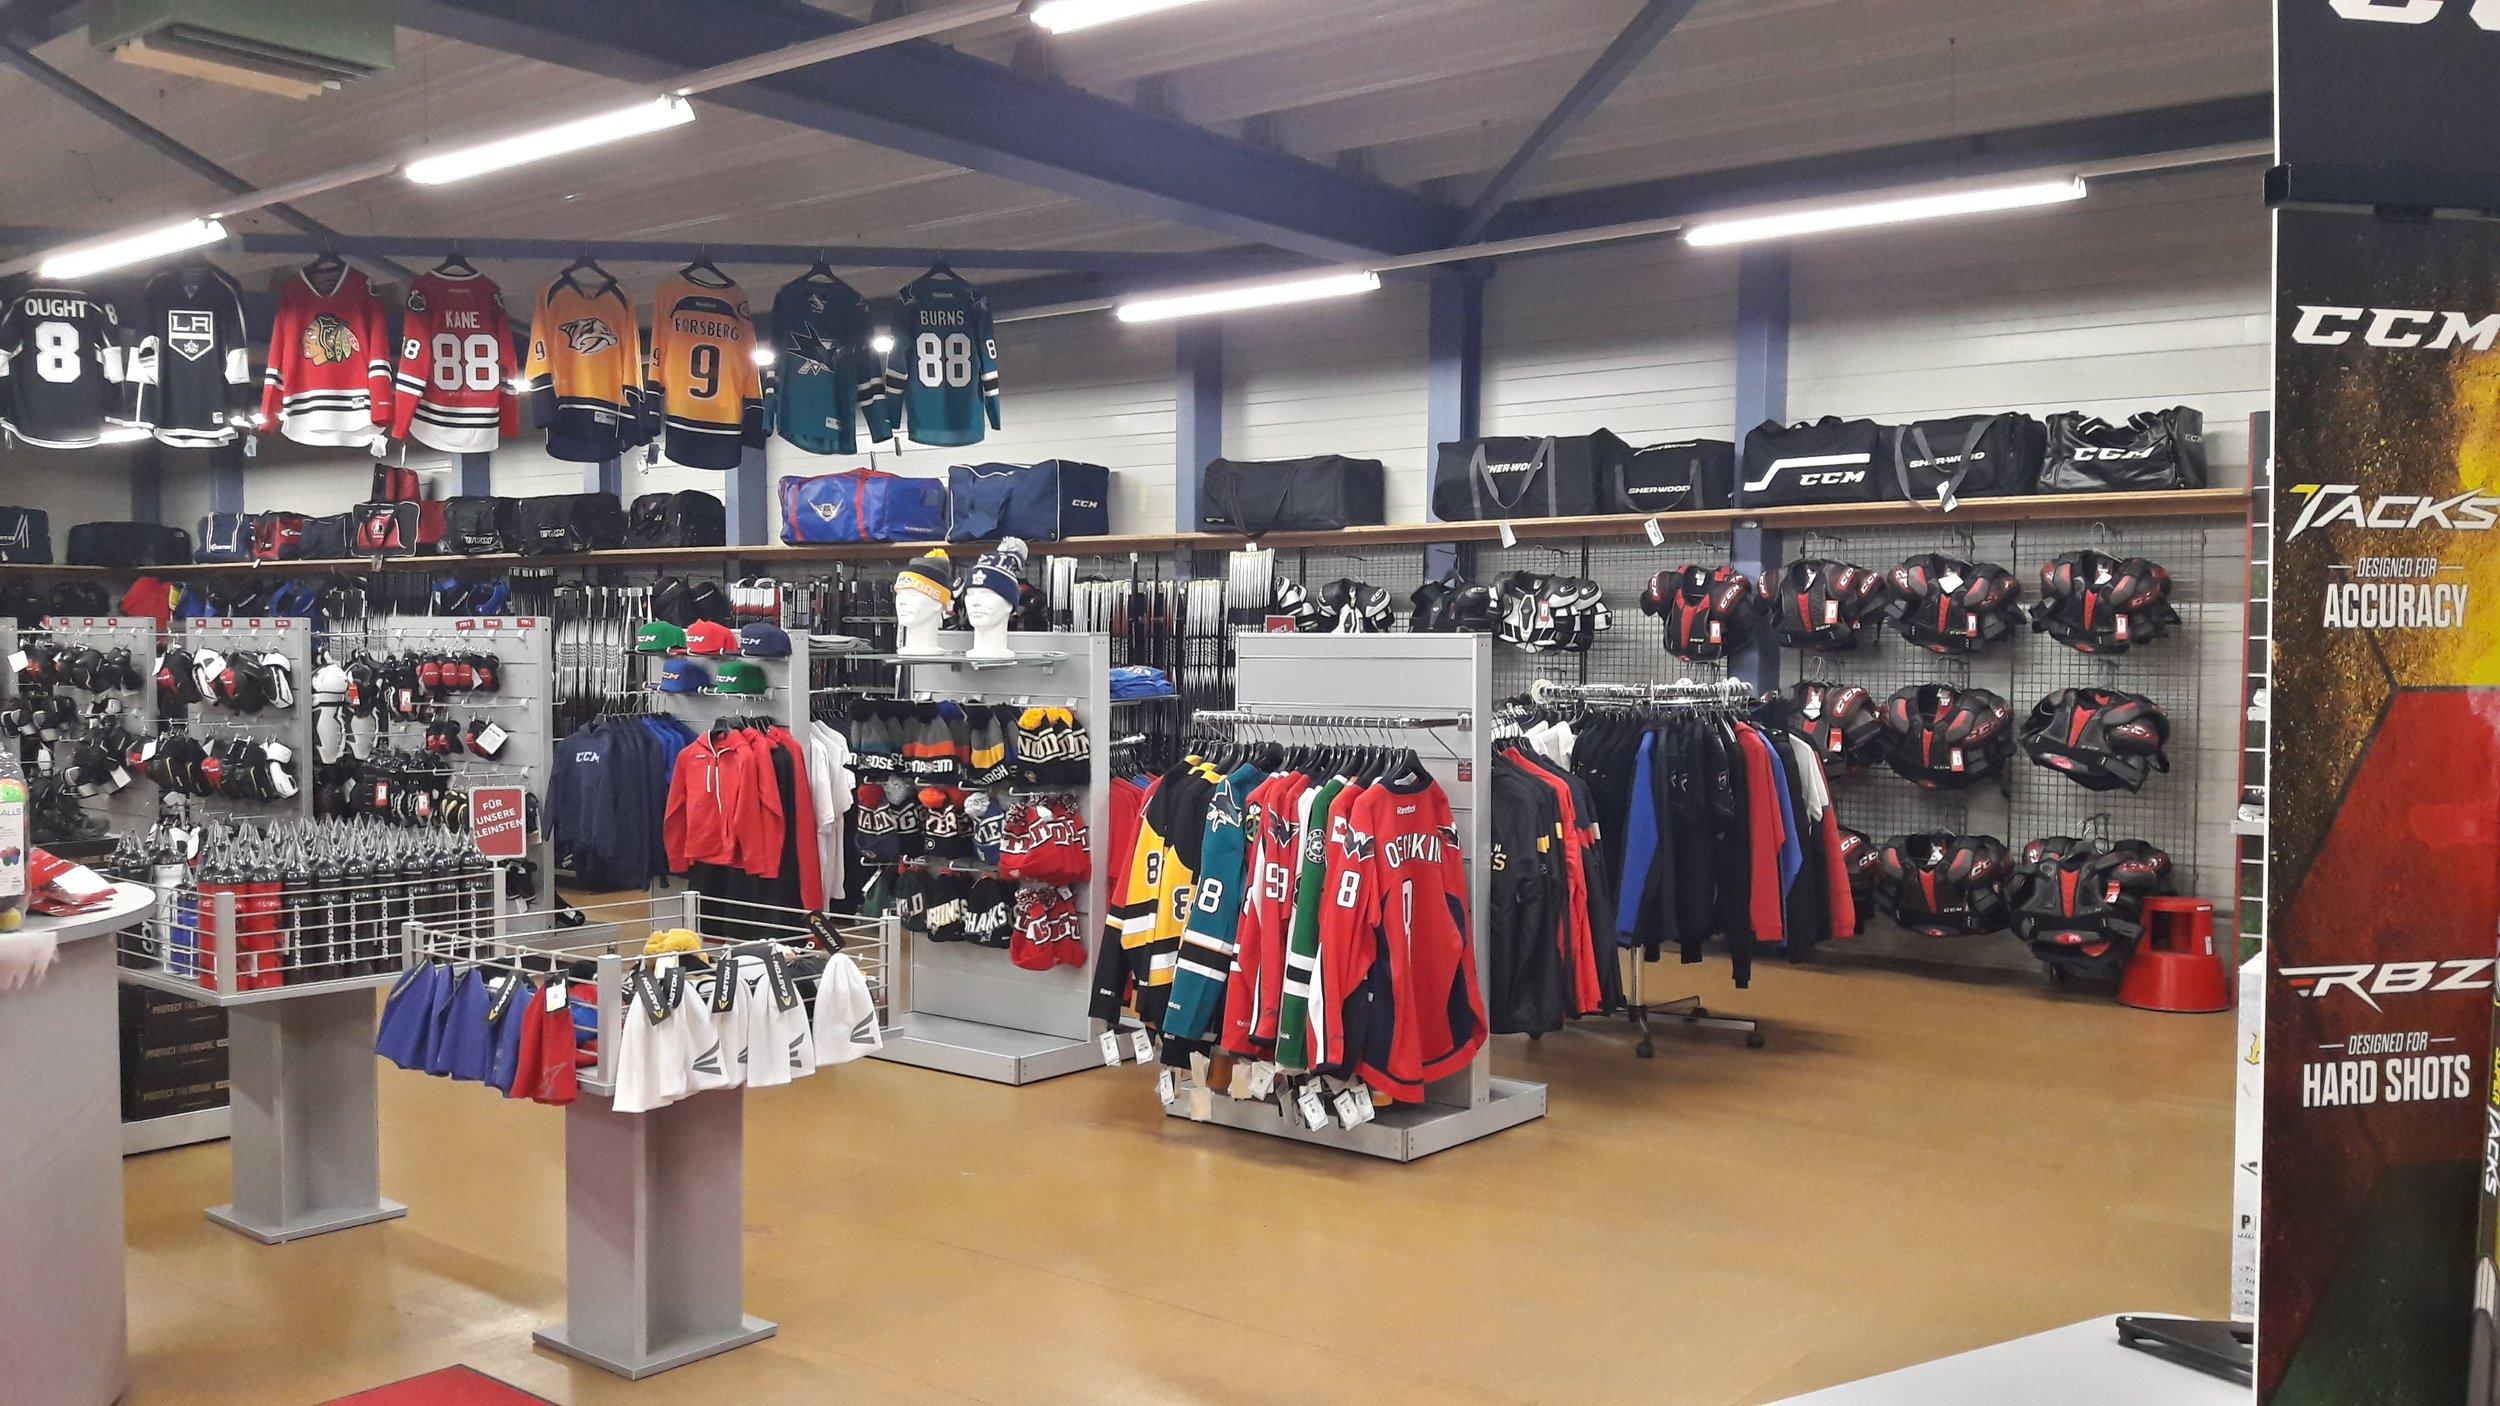 Conte Hockeyshop Rickenbach - Ringstrasse 179532 Rickenbach bei Wil+41 71 929 00 25